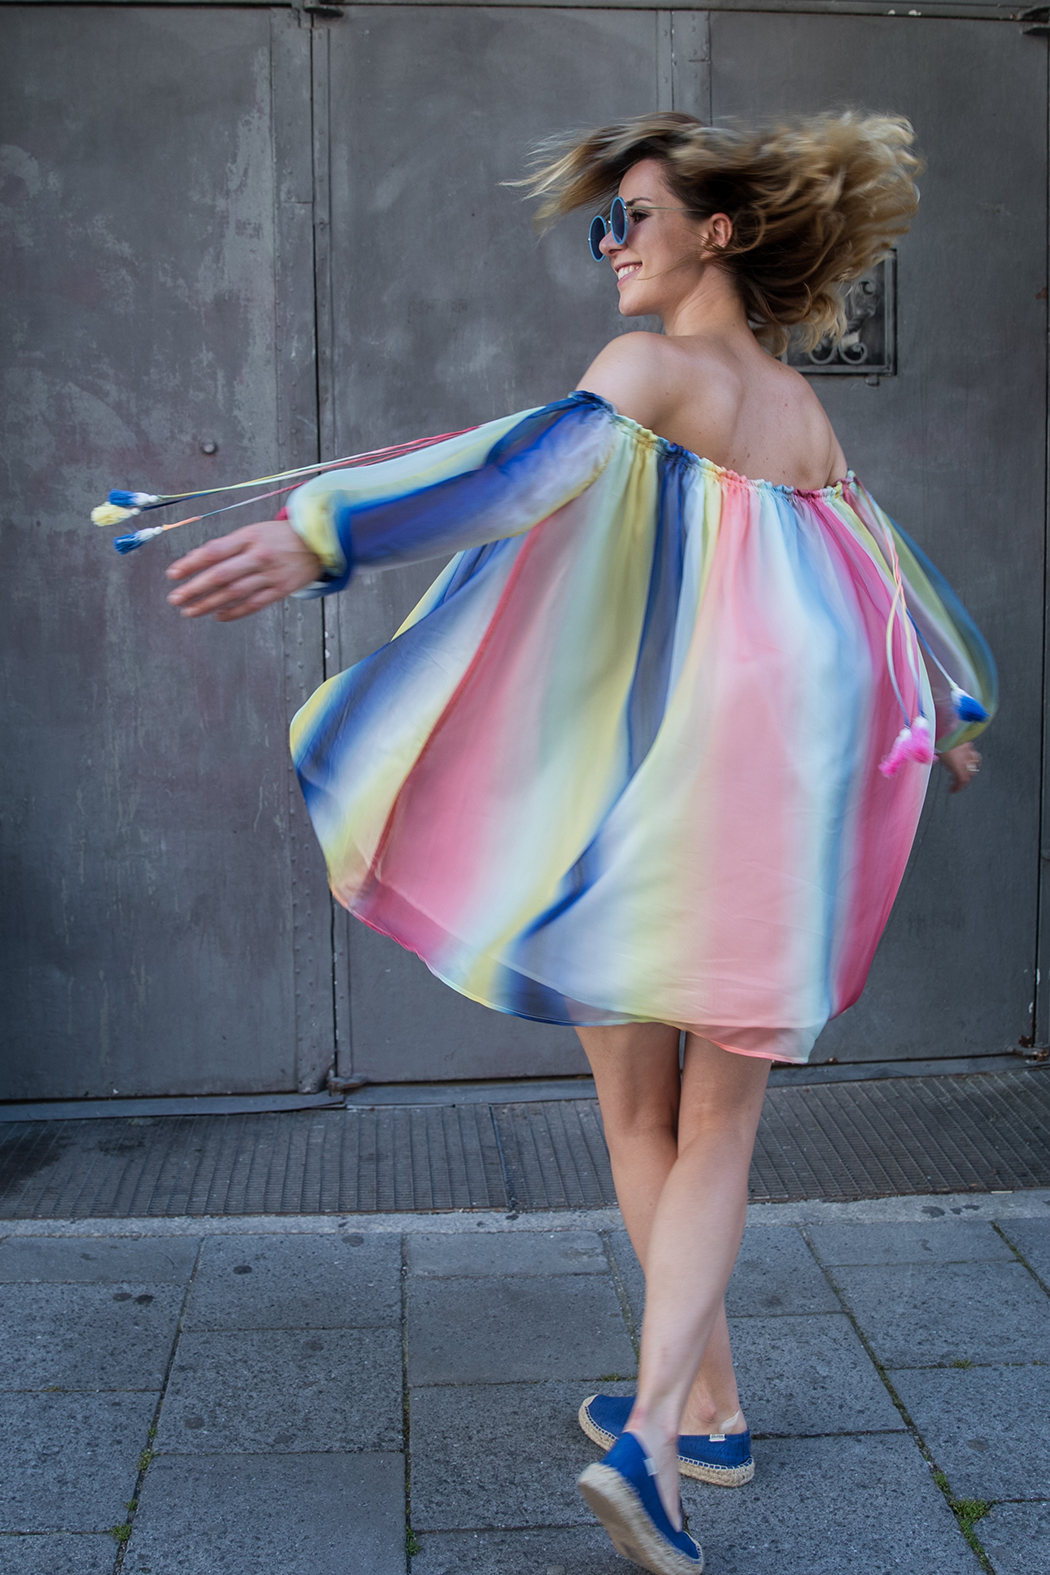 Fashionblog-Fashionblogger-Fashion-Blog-Blogger-Modeblog-Modeblogger-Mode-Rainbow-Dress-Chloe-Regenbogen-Lindarella-6